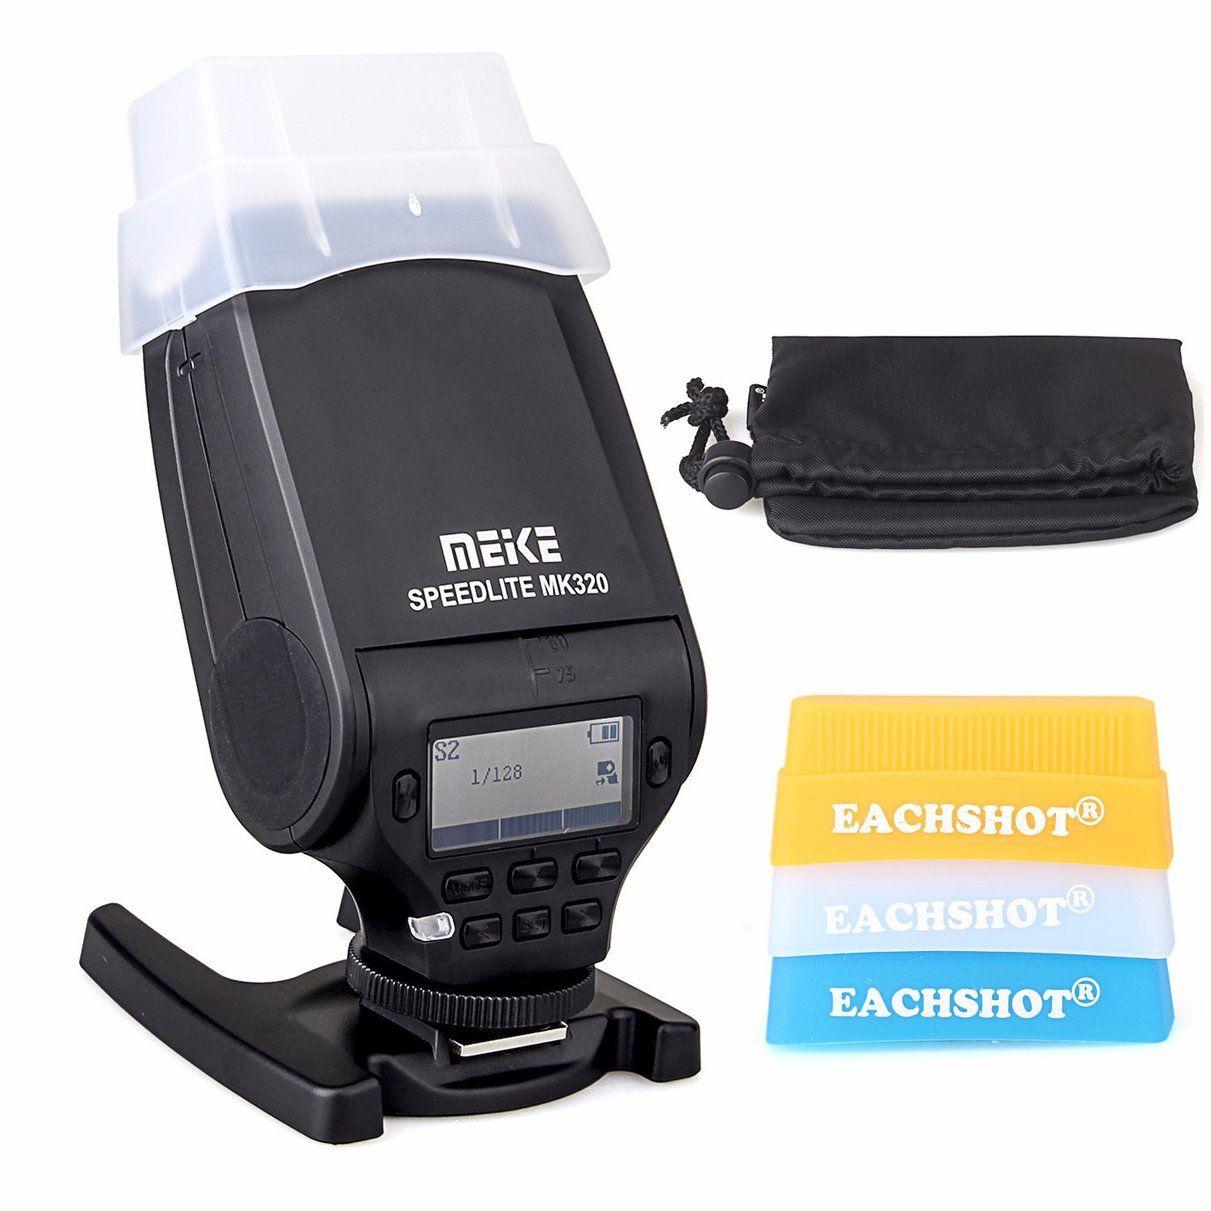 MEIKE MK-320 TTL Master HSS flash Speedlite for Canon EOS M M2 100D 5D II III 6D 7D 60D 70D 600D 7D mark II 700D 1100D T3i T2i